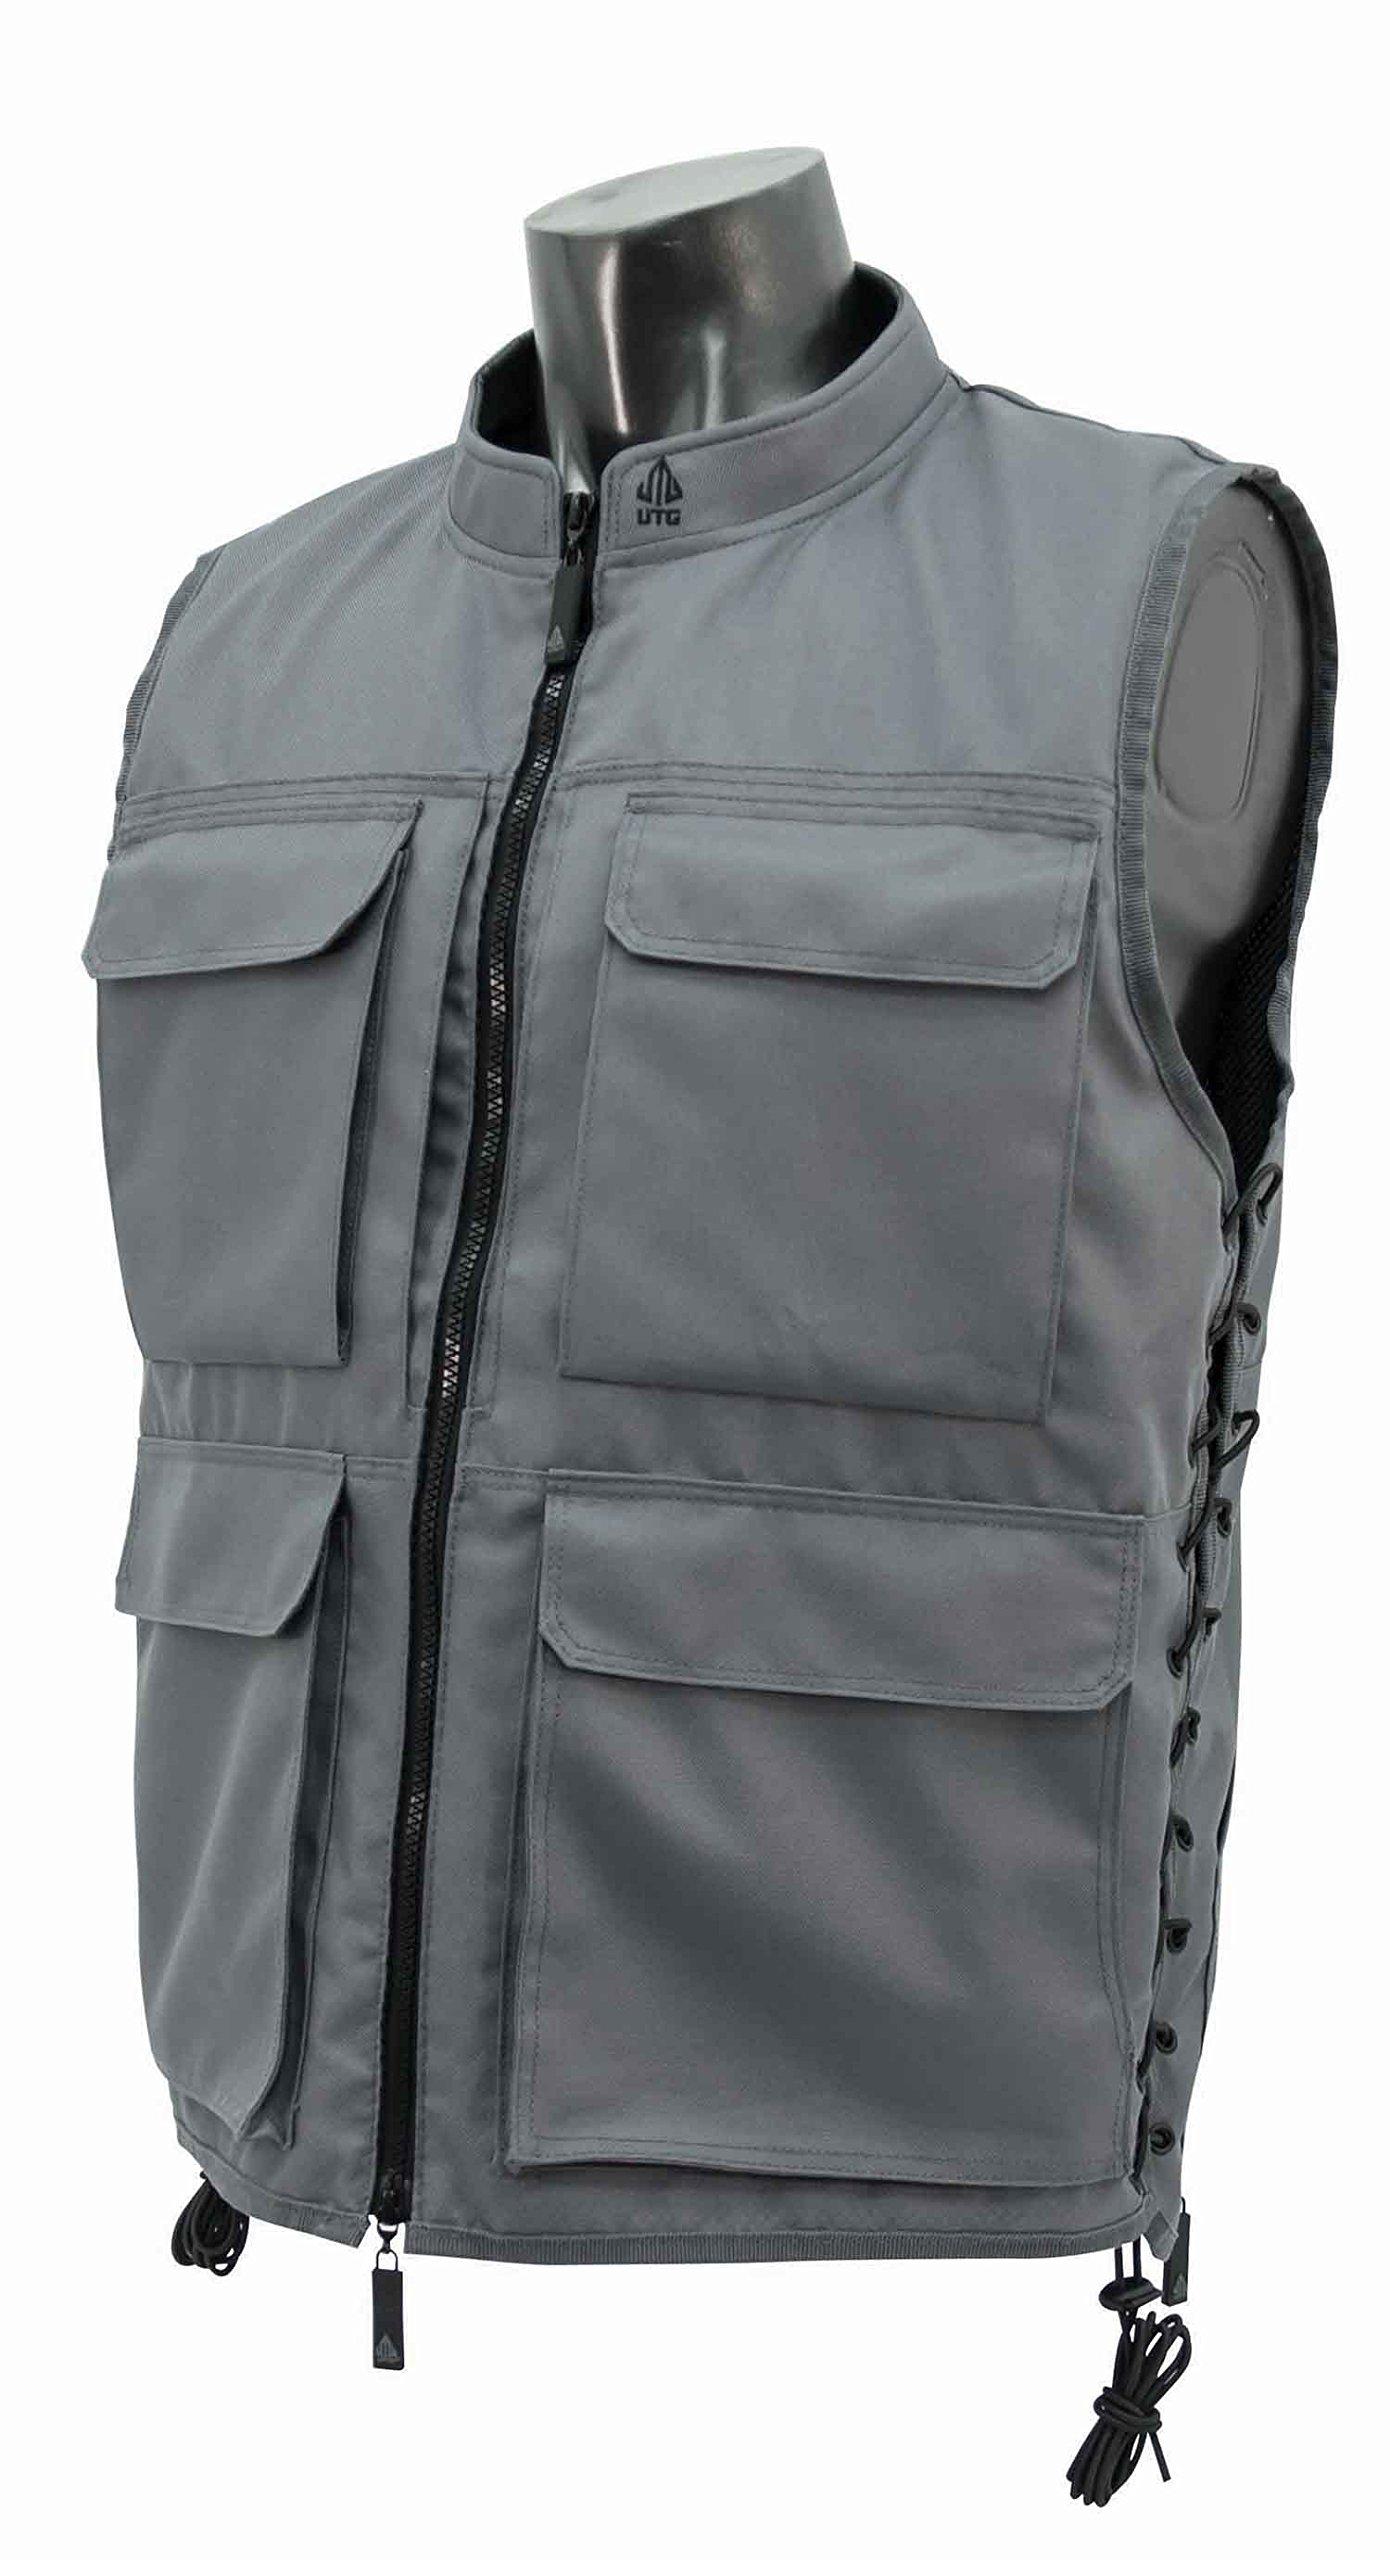 UTG True Hunter Male Sporting Vest (M to XL), Gray/Black by UTG